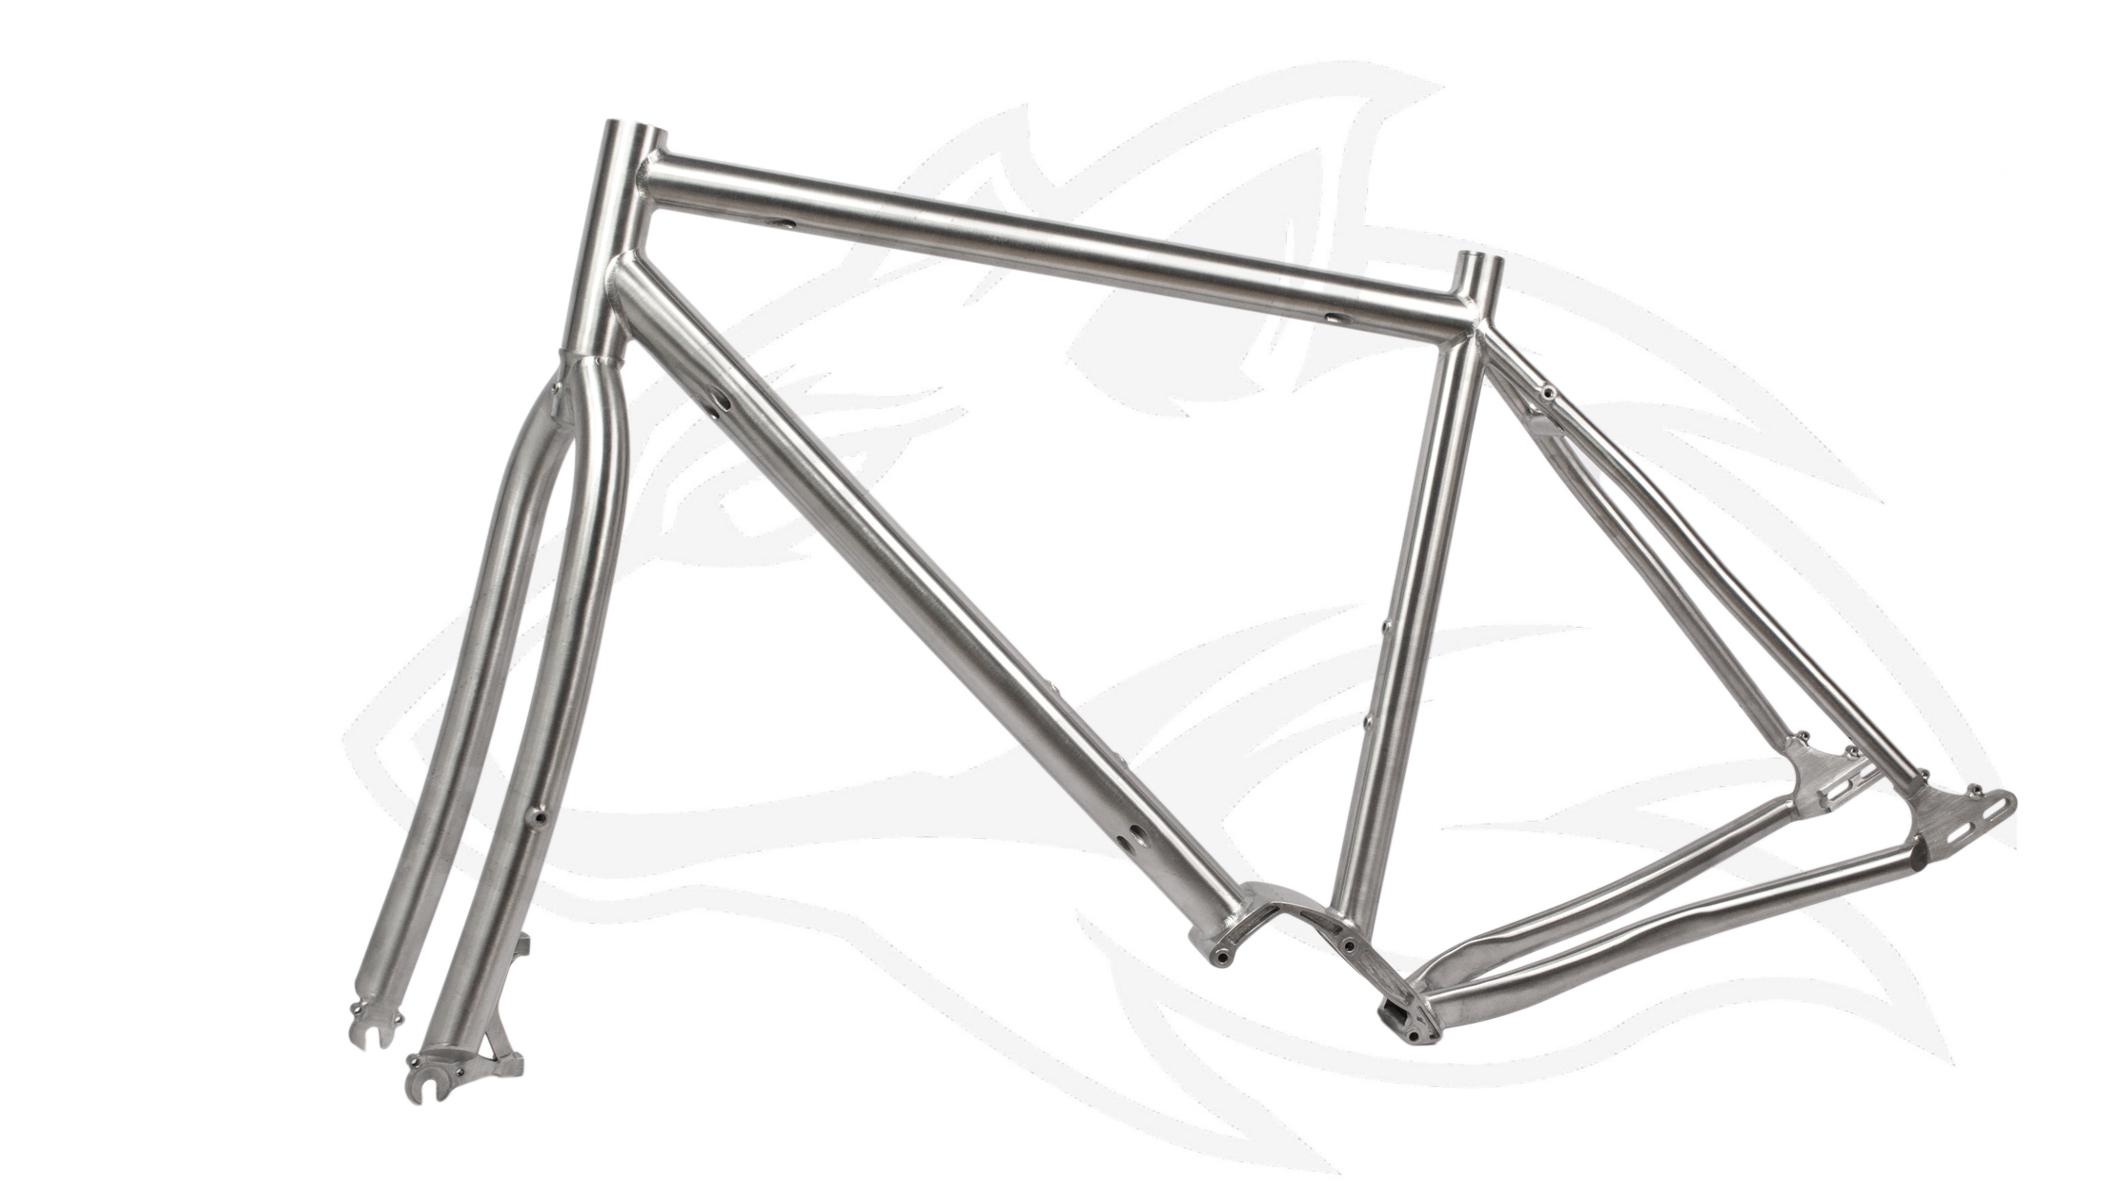 Pinion Titan Reiserad Set - Individueller Fahrradbau - Titanteile